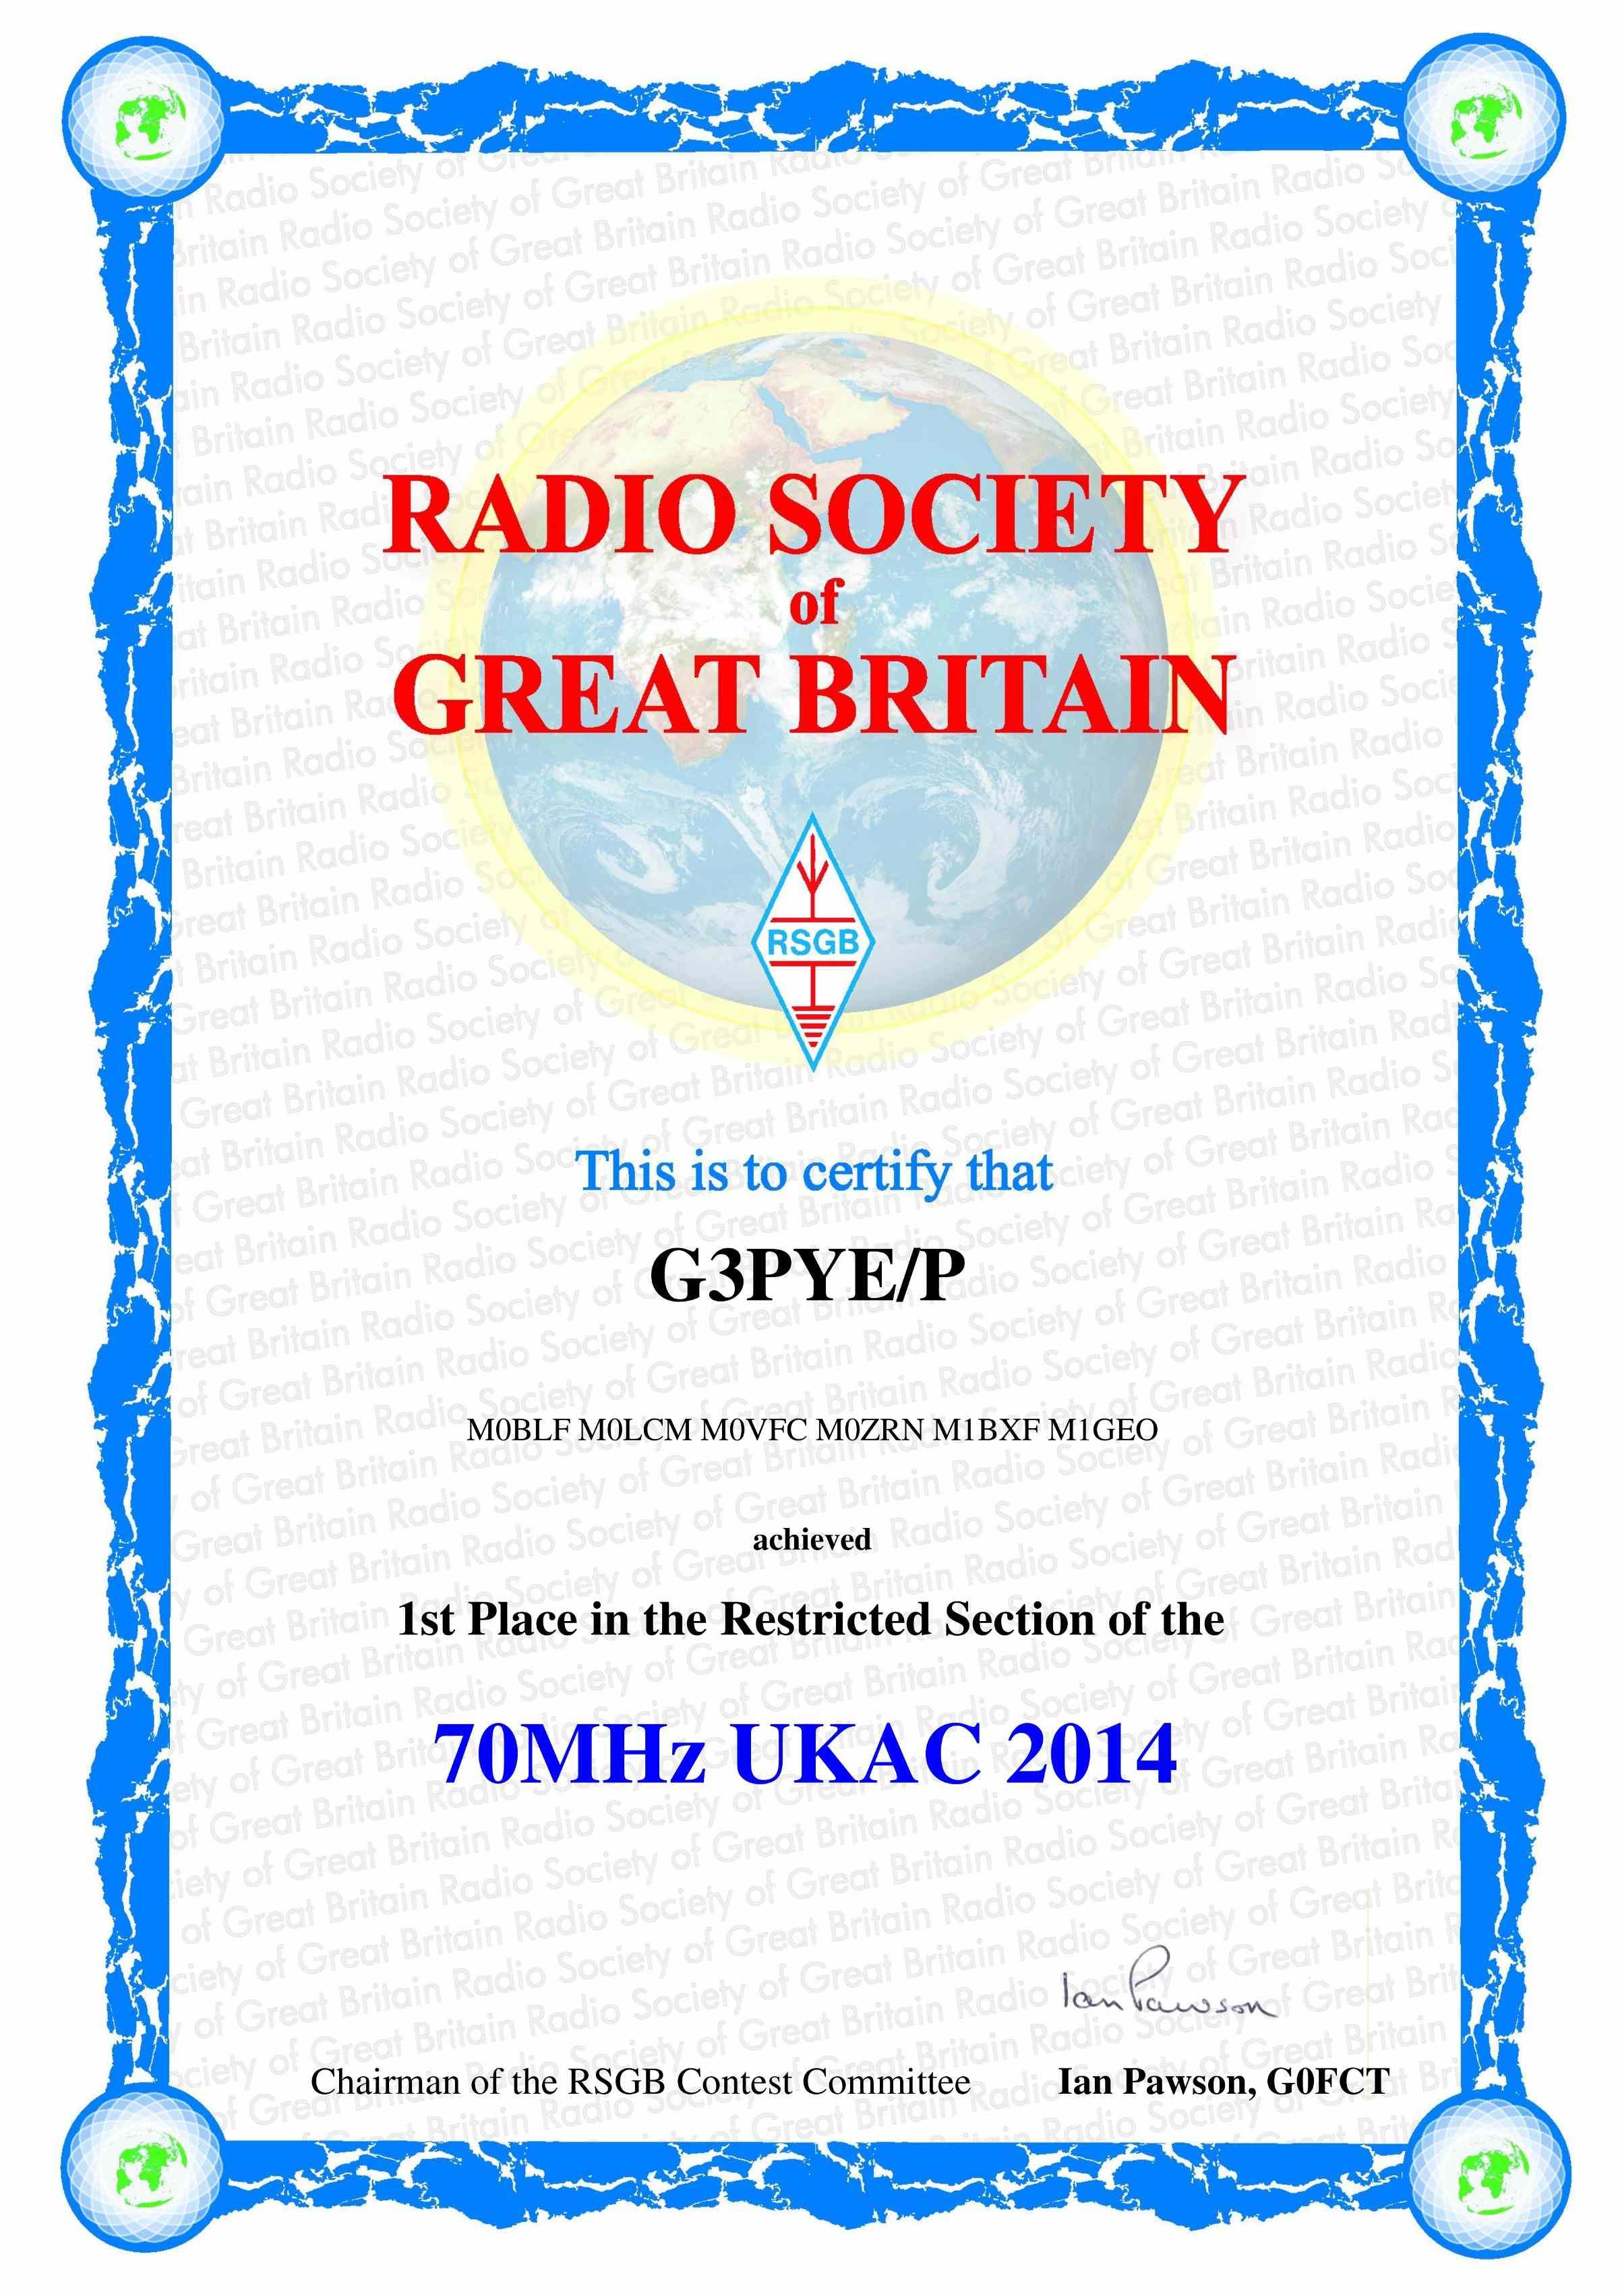 G3PYE/p 70 MHz UKAC 2014